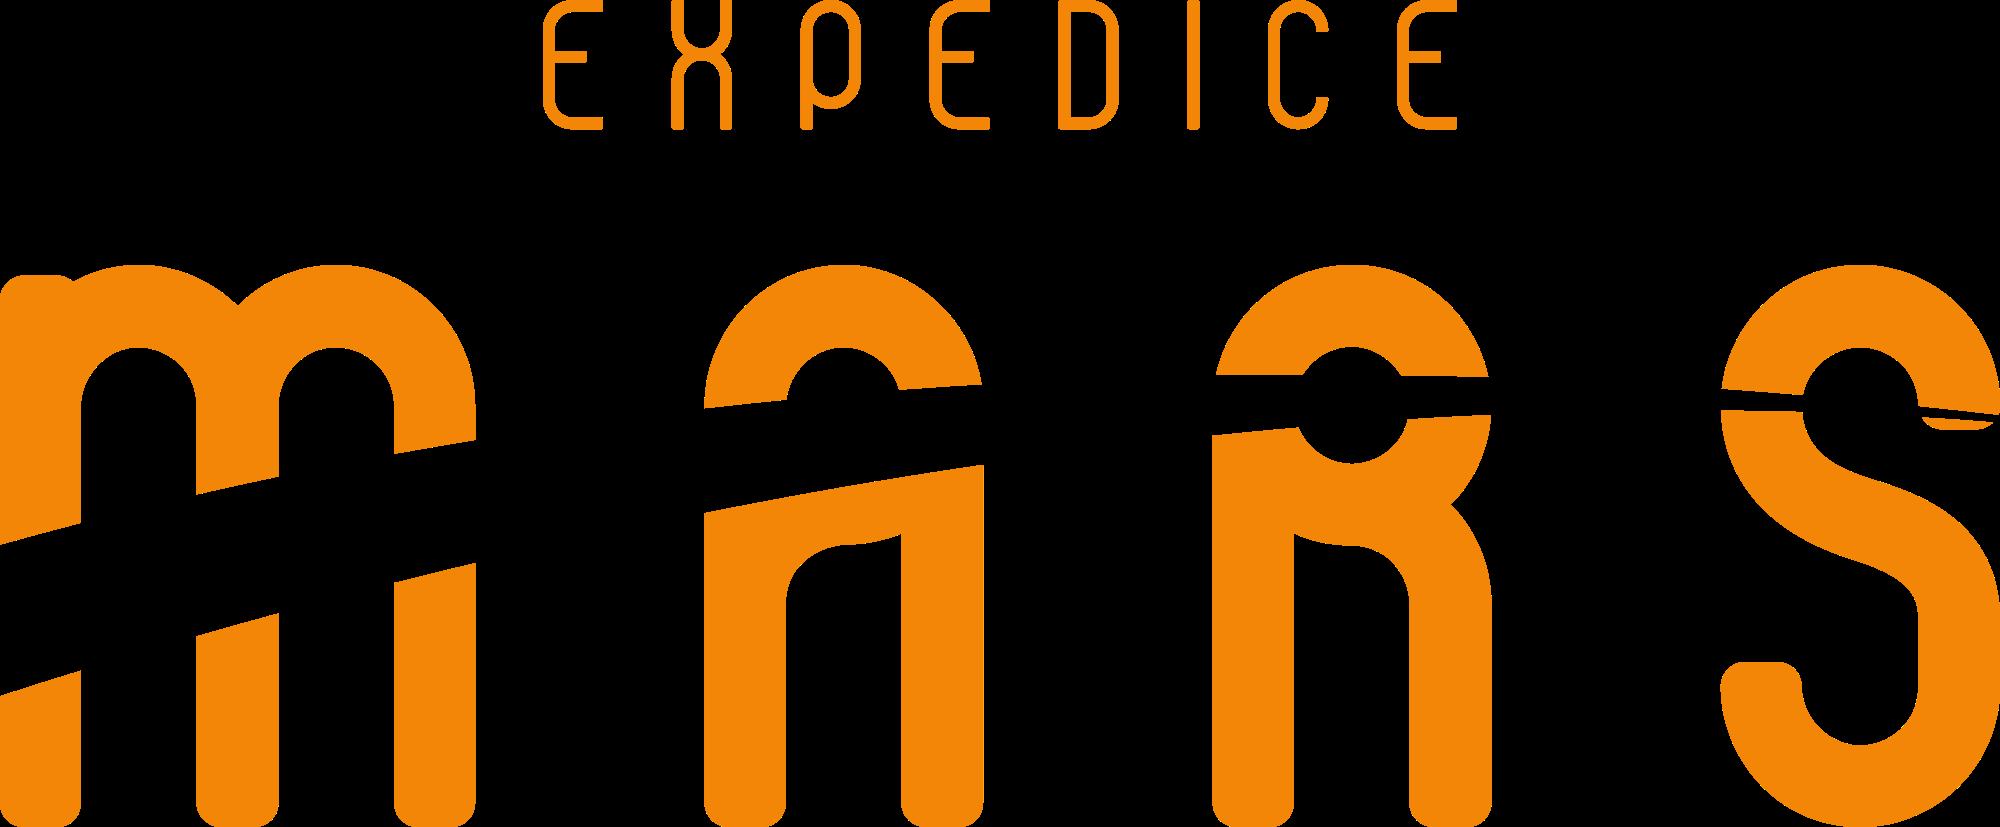 Expedice Mars